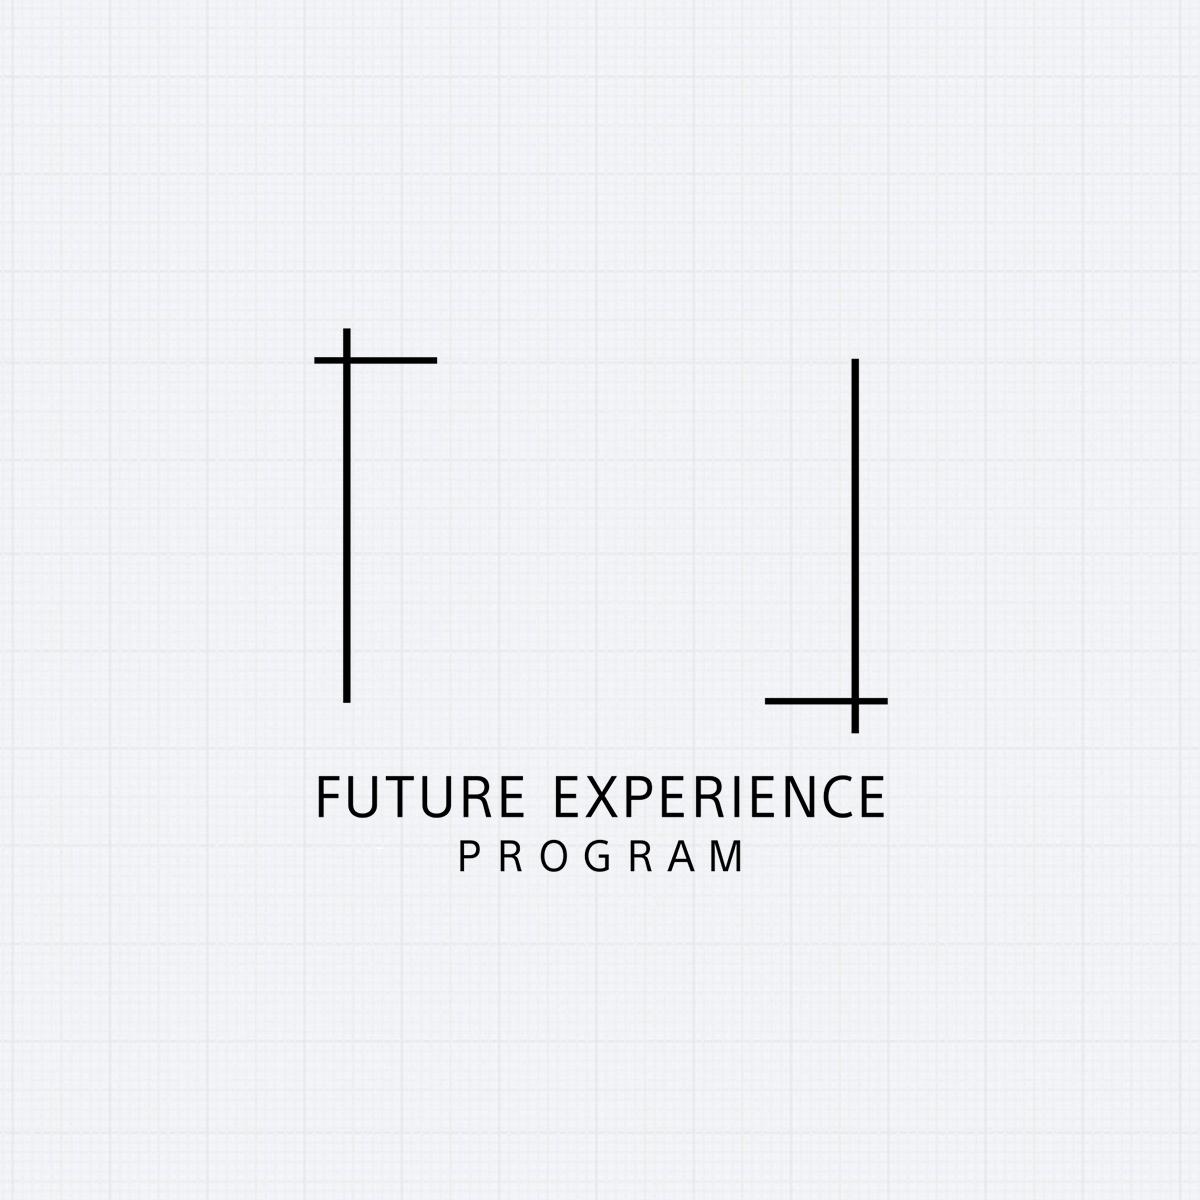 Future Experience Program